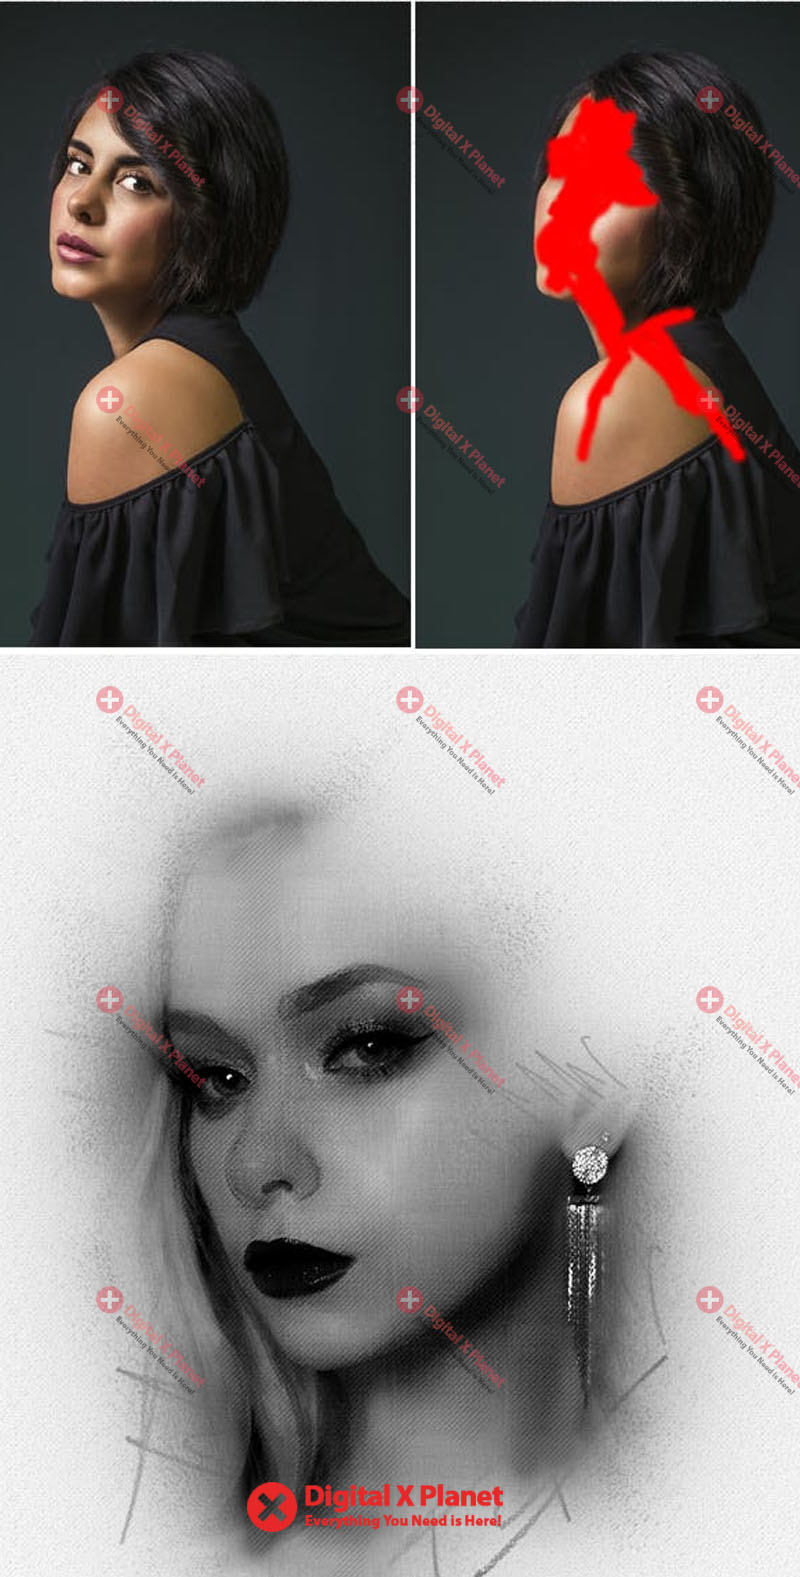 Pencil sketch photoshop action free download